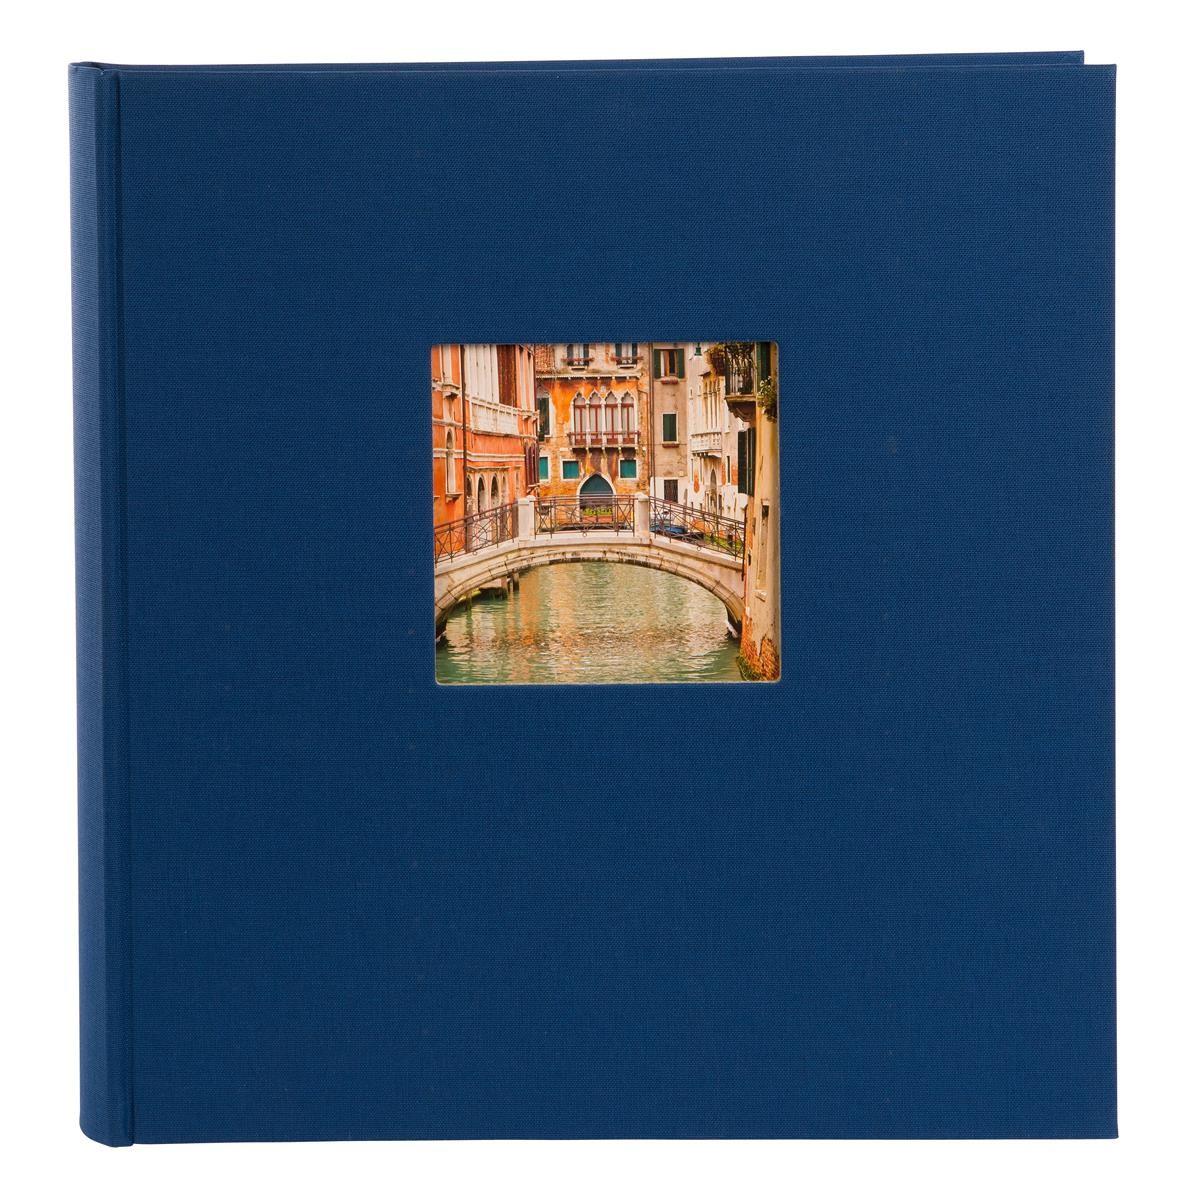 Goldbuch Fotoalbum net BV blau Fotoalbum 31 975